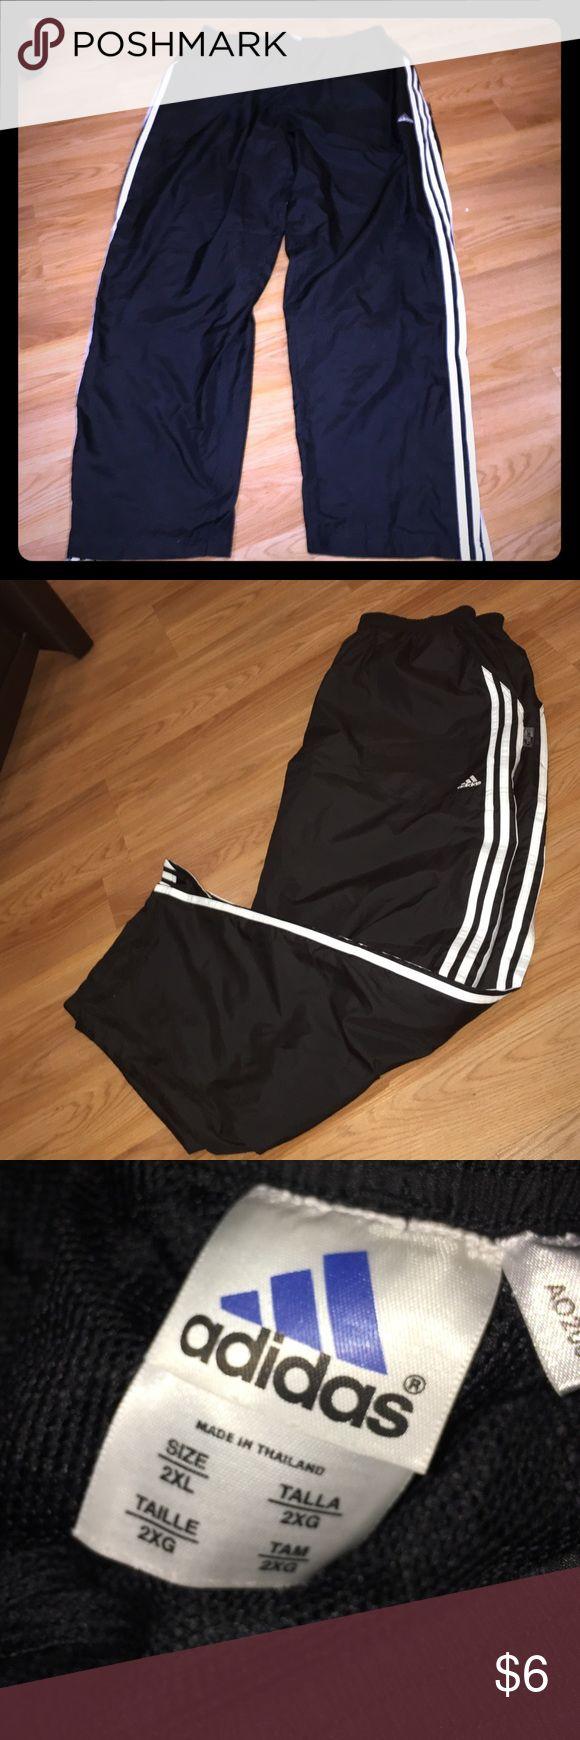 Adidas athletic pants! Great windbreaker type pants. Drawstring waist. Adidas Pants